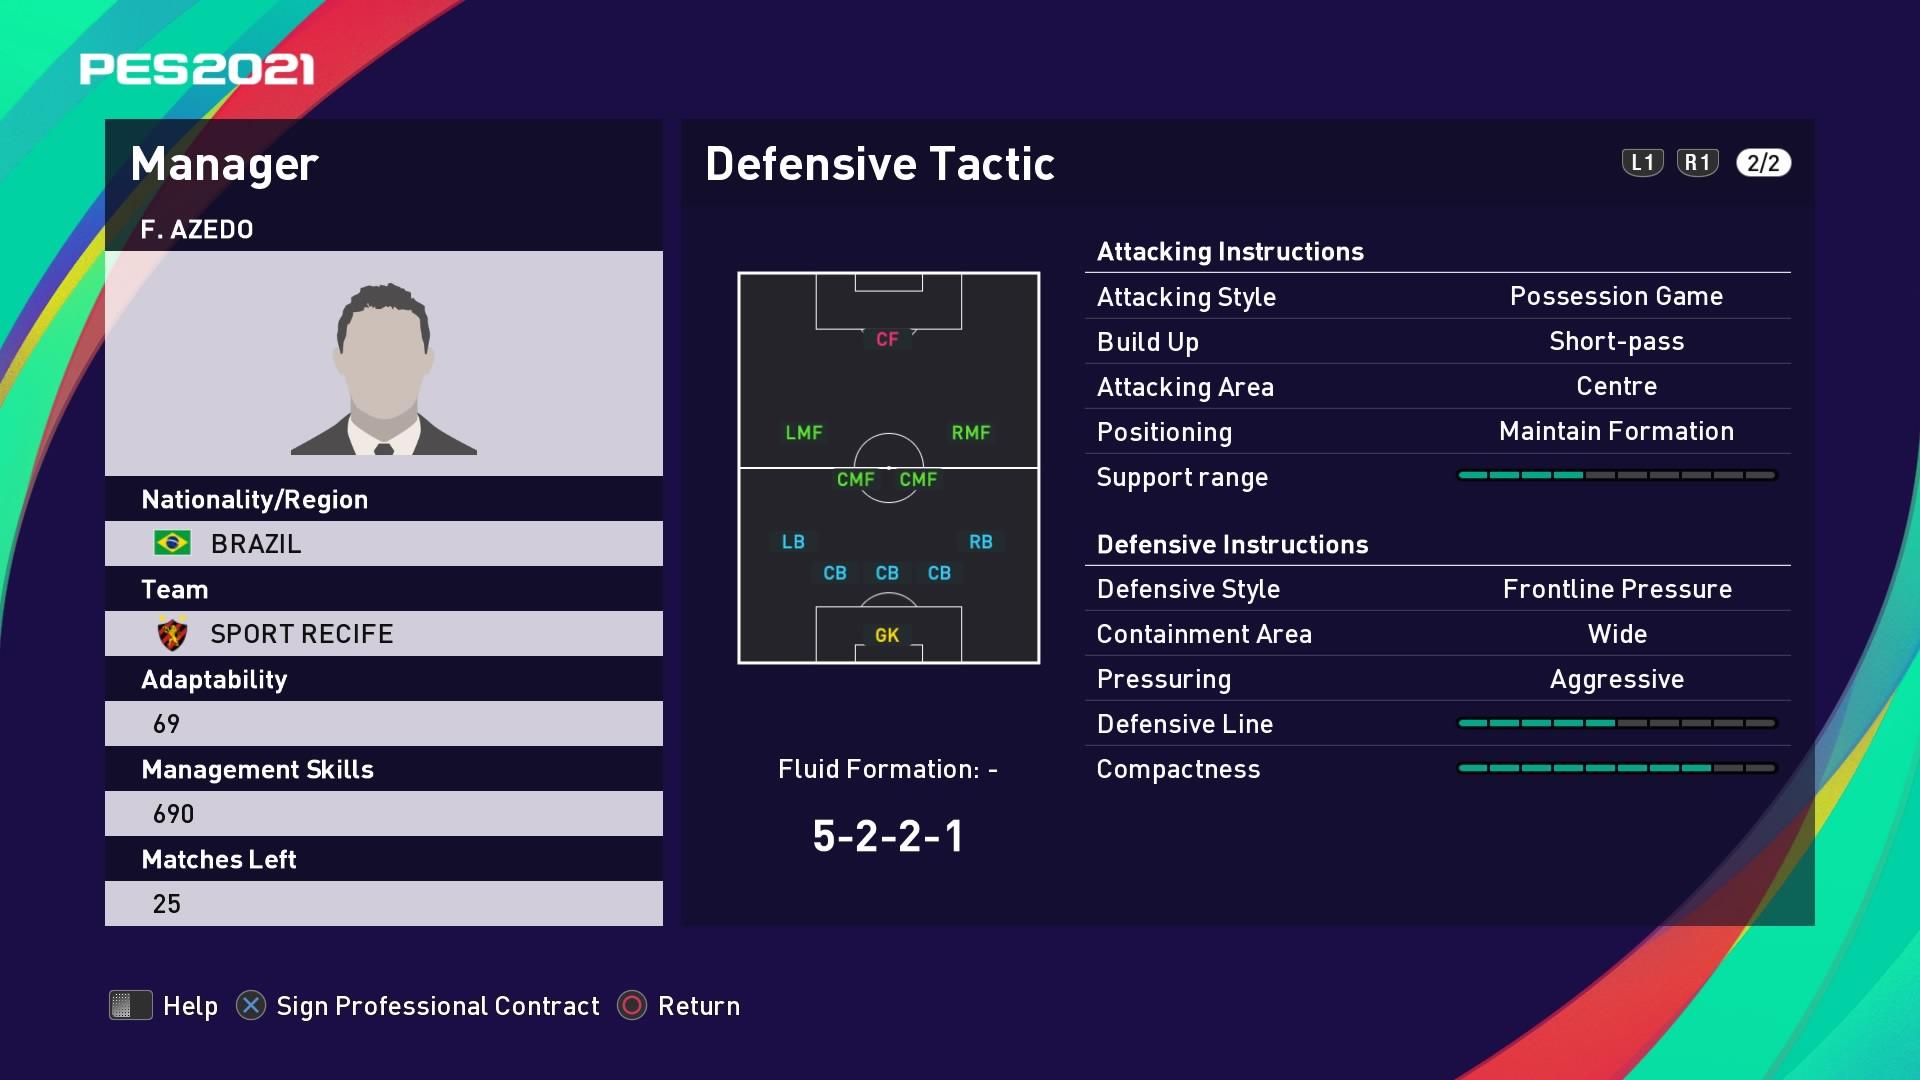 F. Azedo (Jair Ventura) Defensive Tactic in PES 2021 myClub